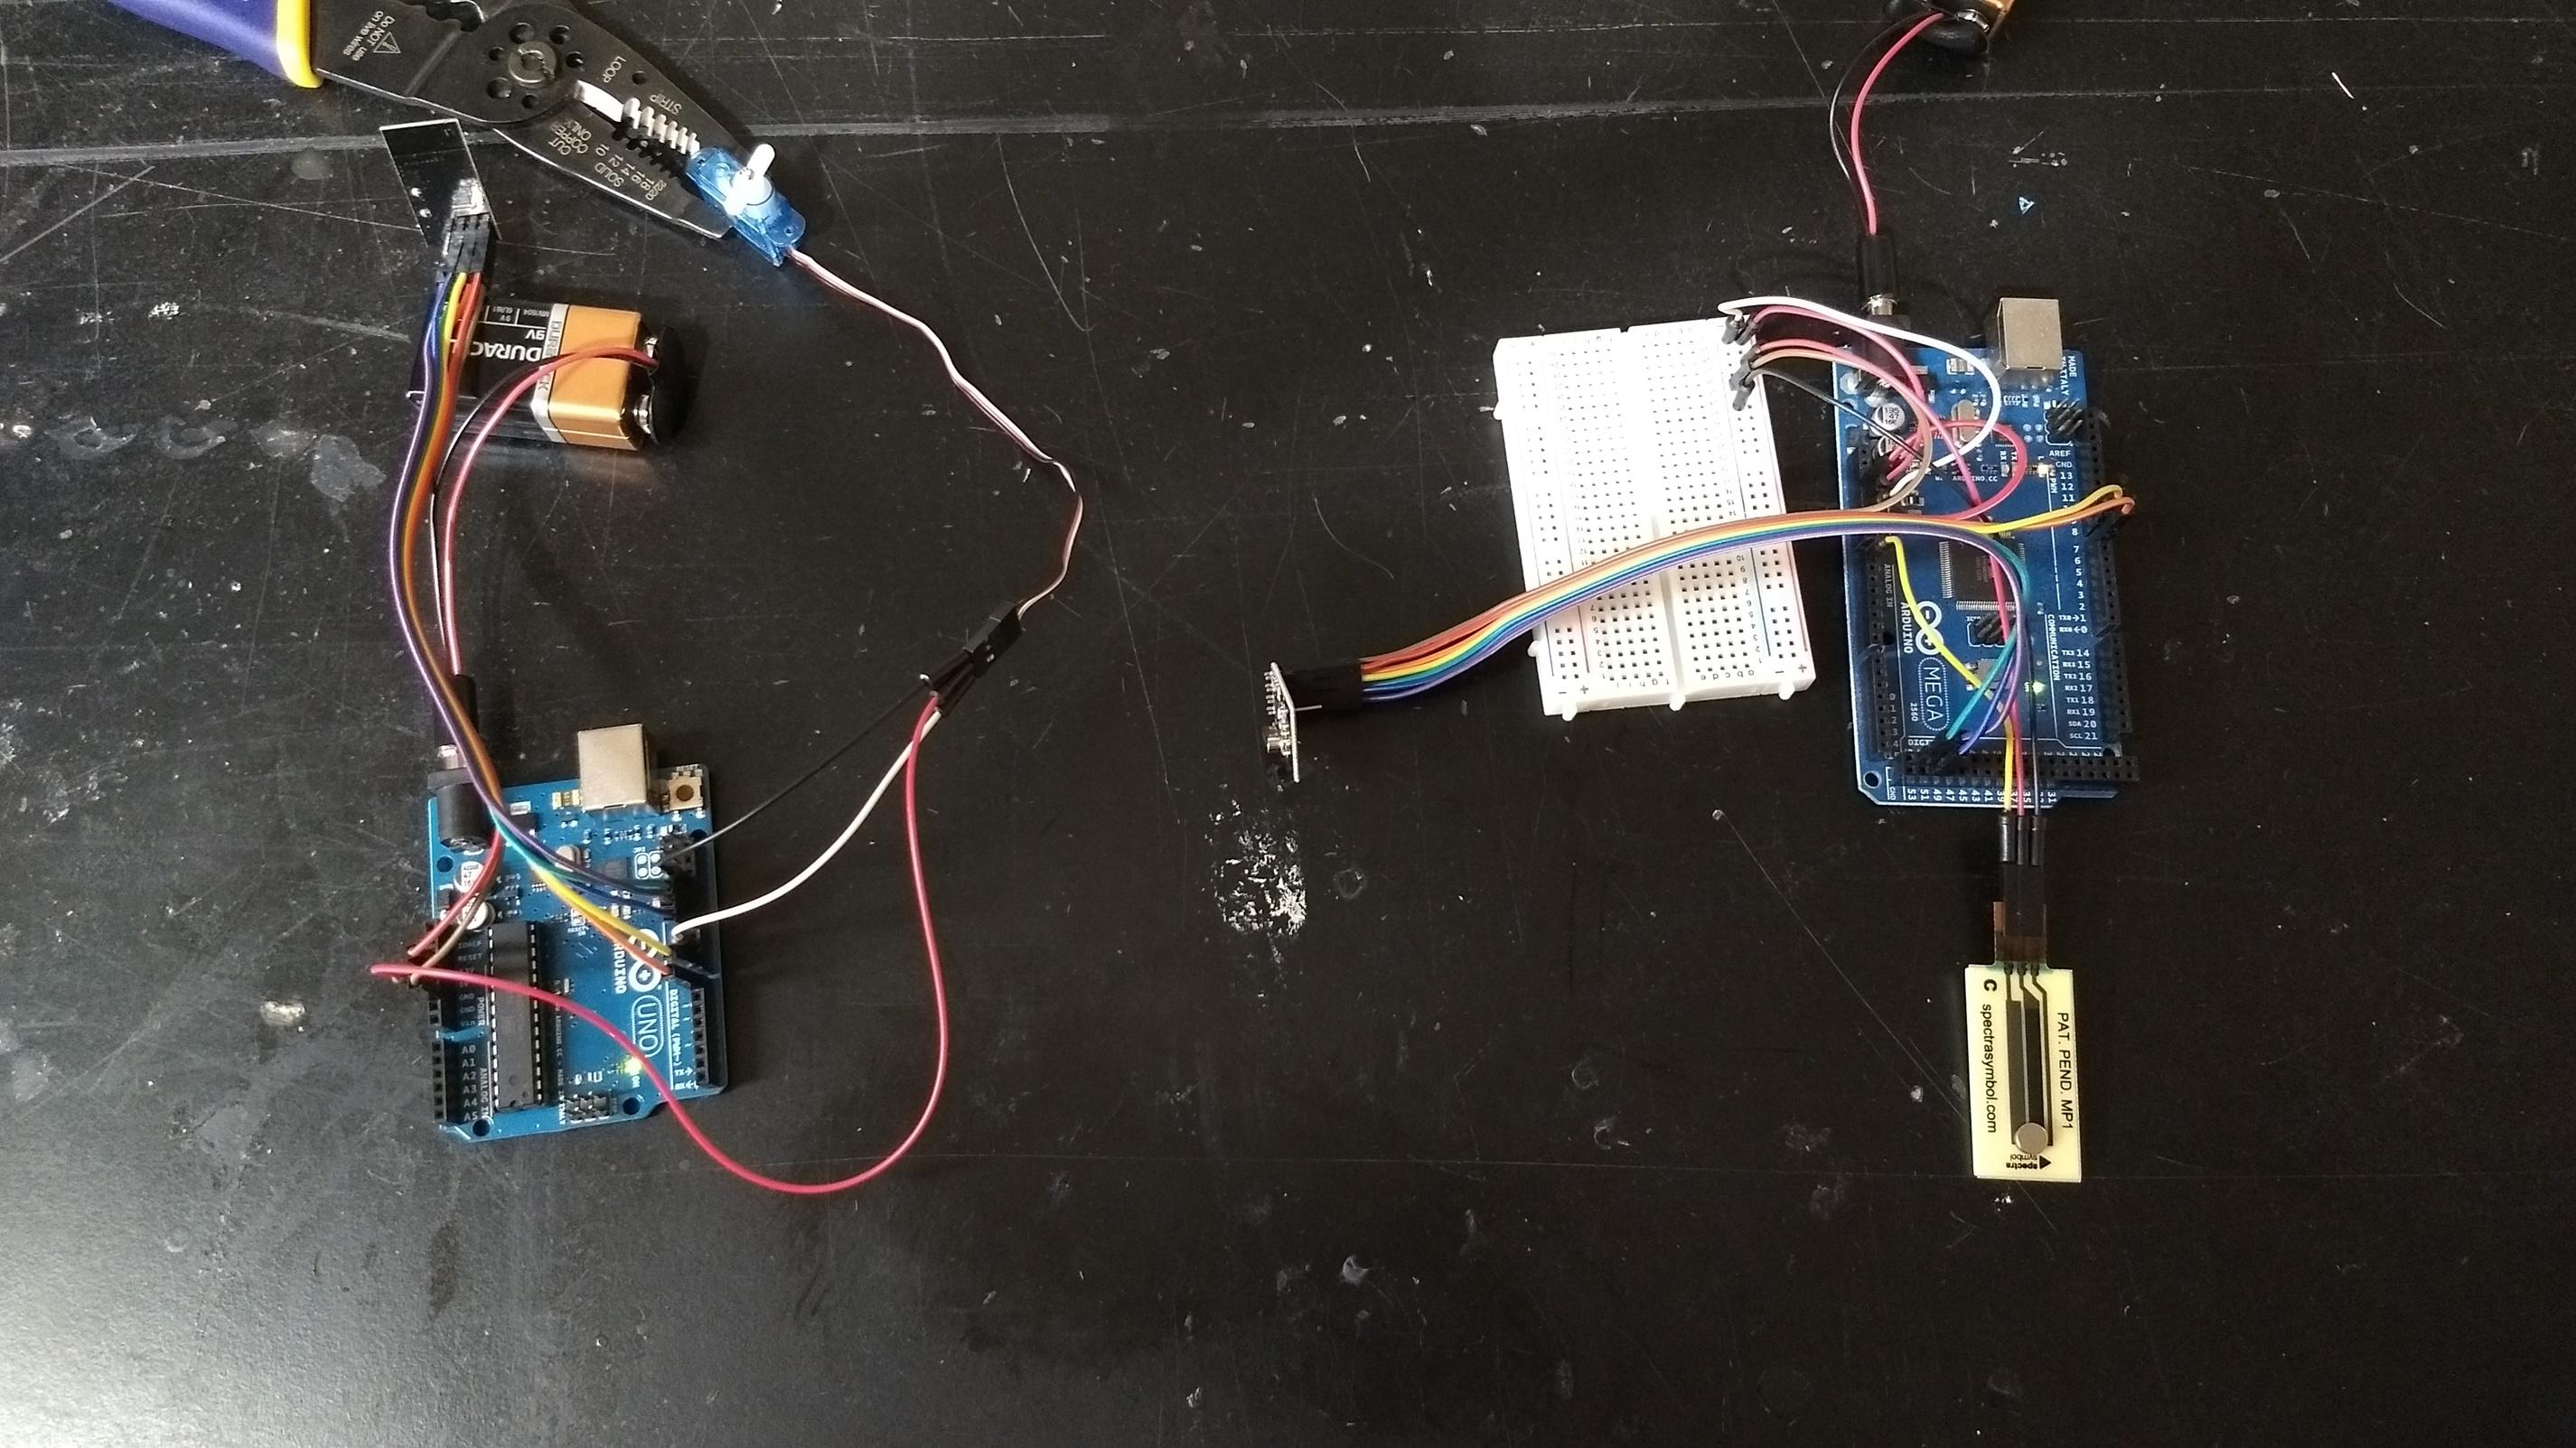 Diy Waterproof Remote Electronics Esc Batteries Arduino Please Rip Apart My Circuit Design Electrical Engineering Img 20171022 145644483 Burst000 Cover Top2851x1603 132 Mb